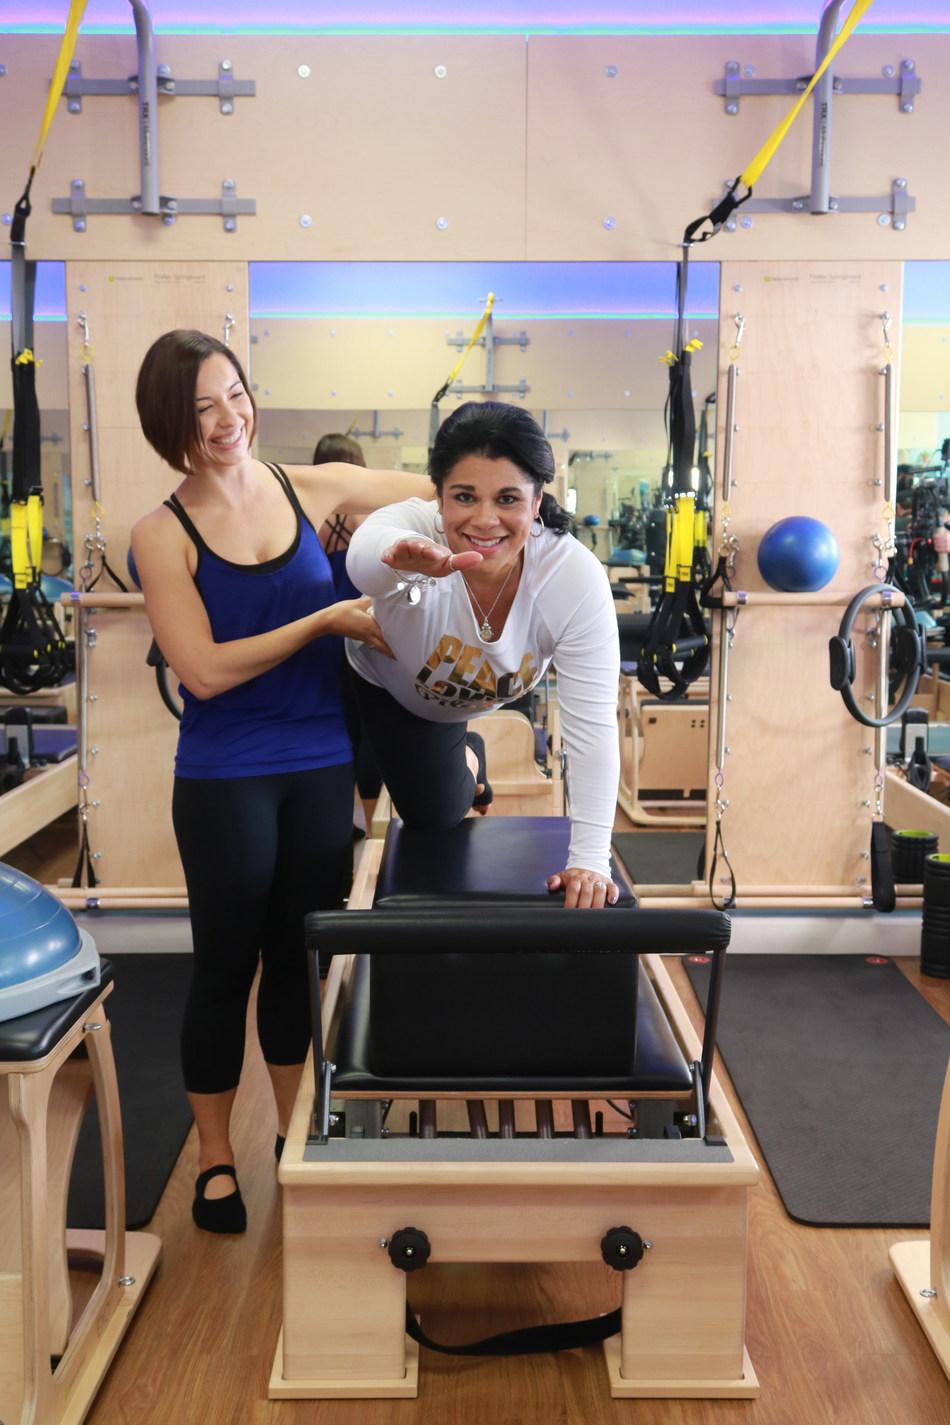 Sarah Luna Training Long Beach Club Pilates Client (PRNewsfoto/Club Pilates)